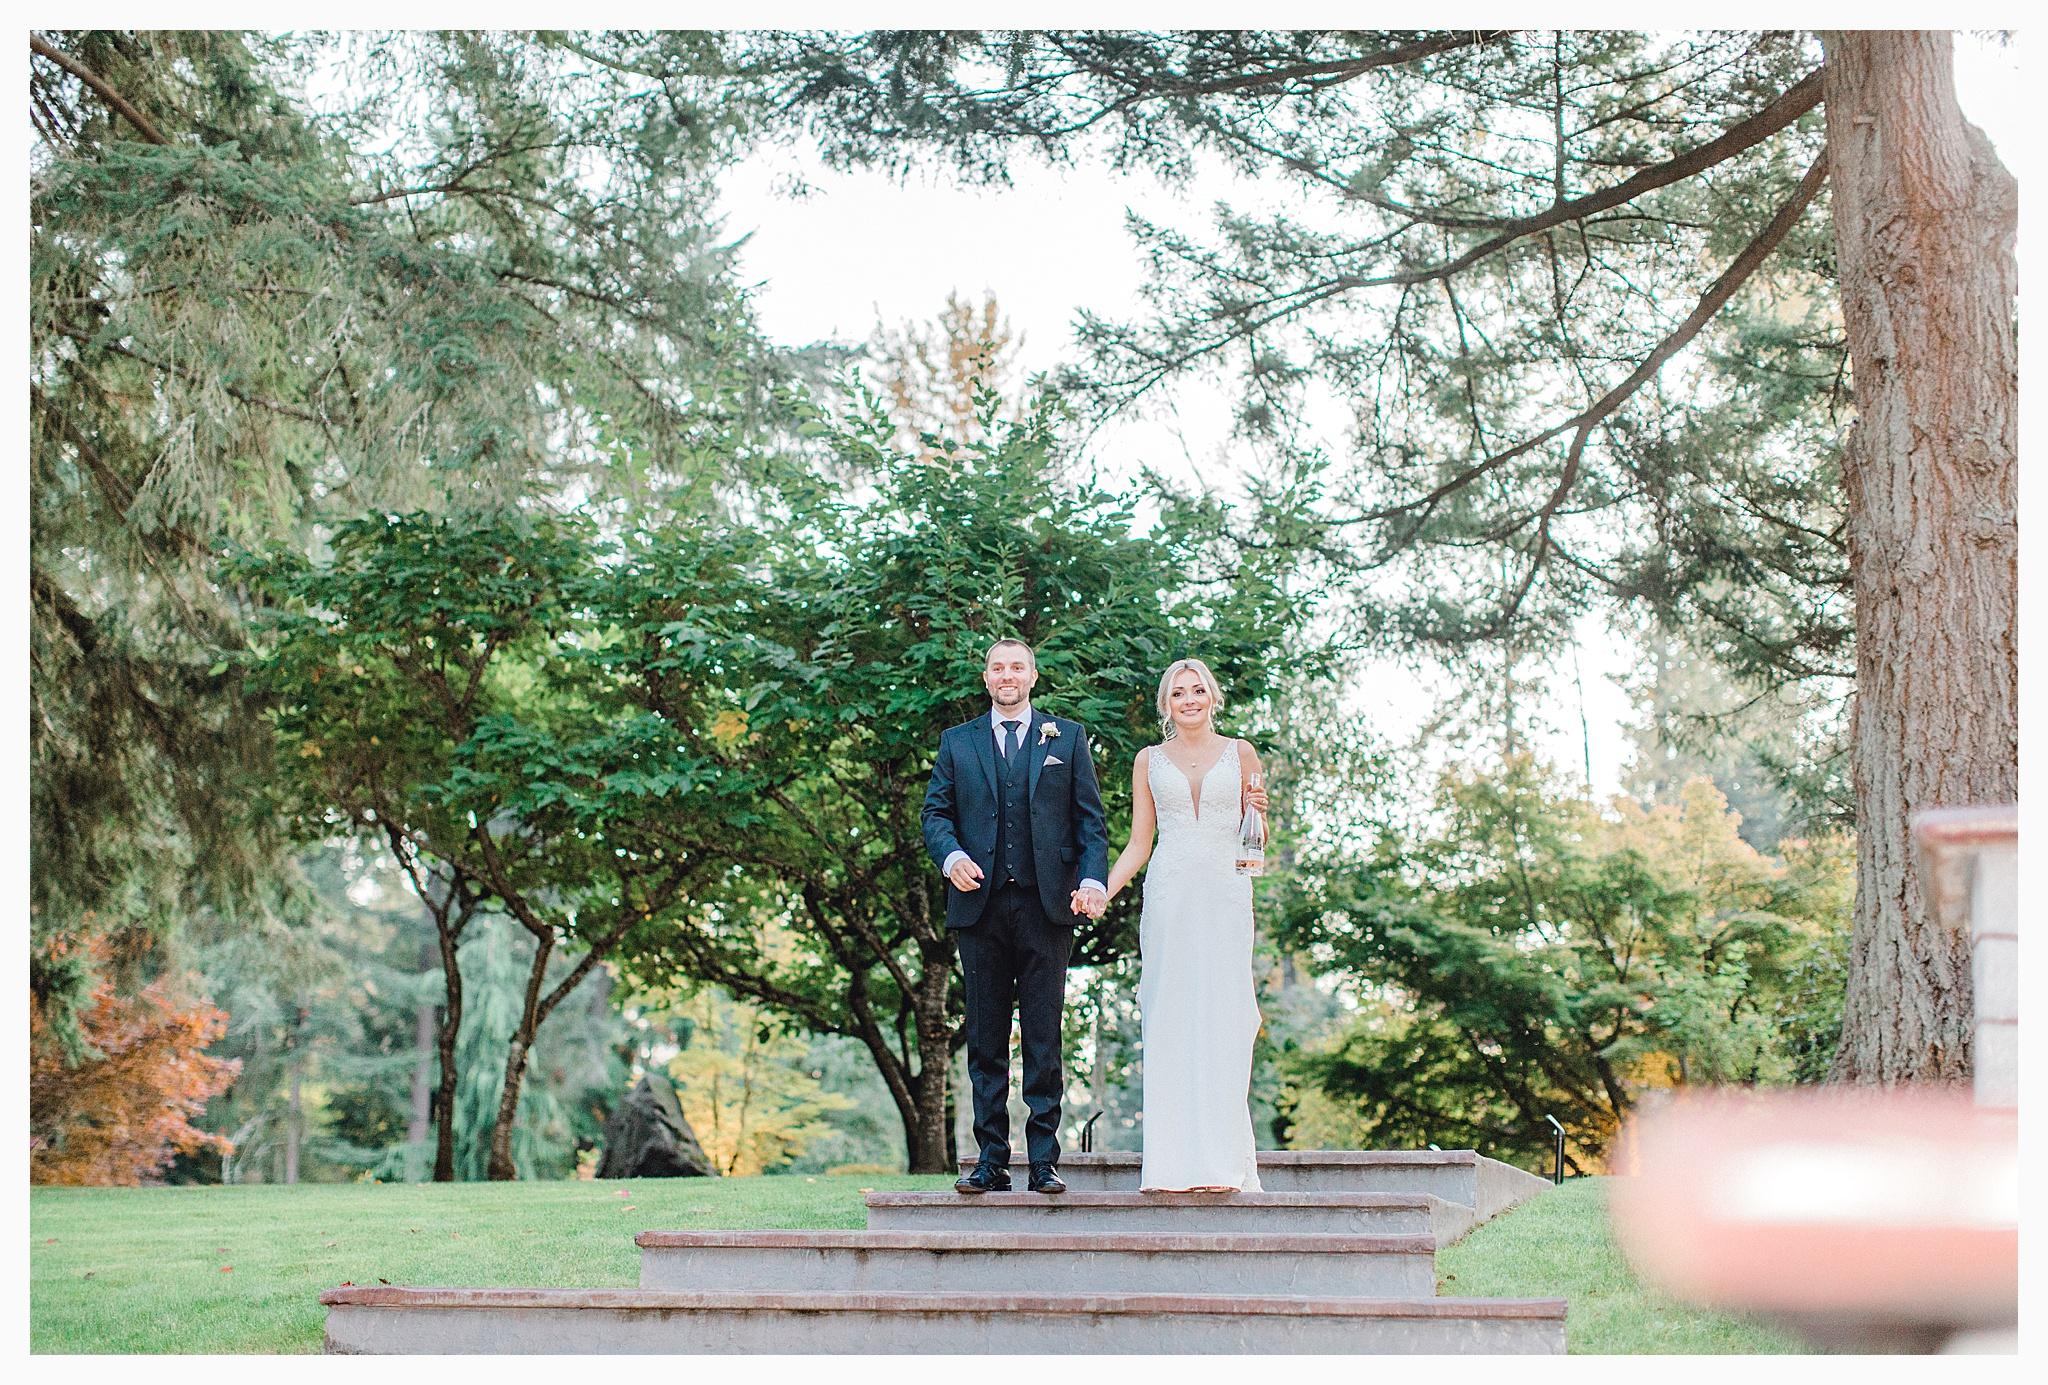 Emma Rose Company Light and Airy Wedding Photographer, Beautiful fall wedding at Rock Creek Gardens Venue in Puyallup, Washington._0093.jpg